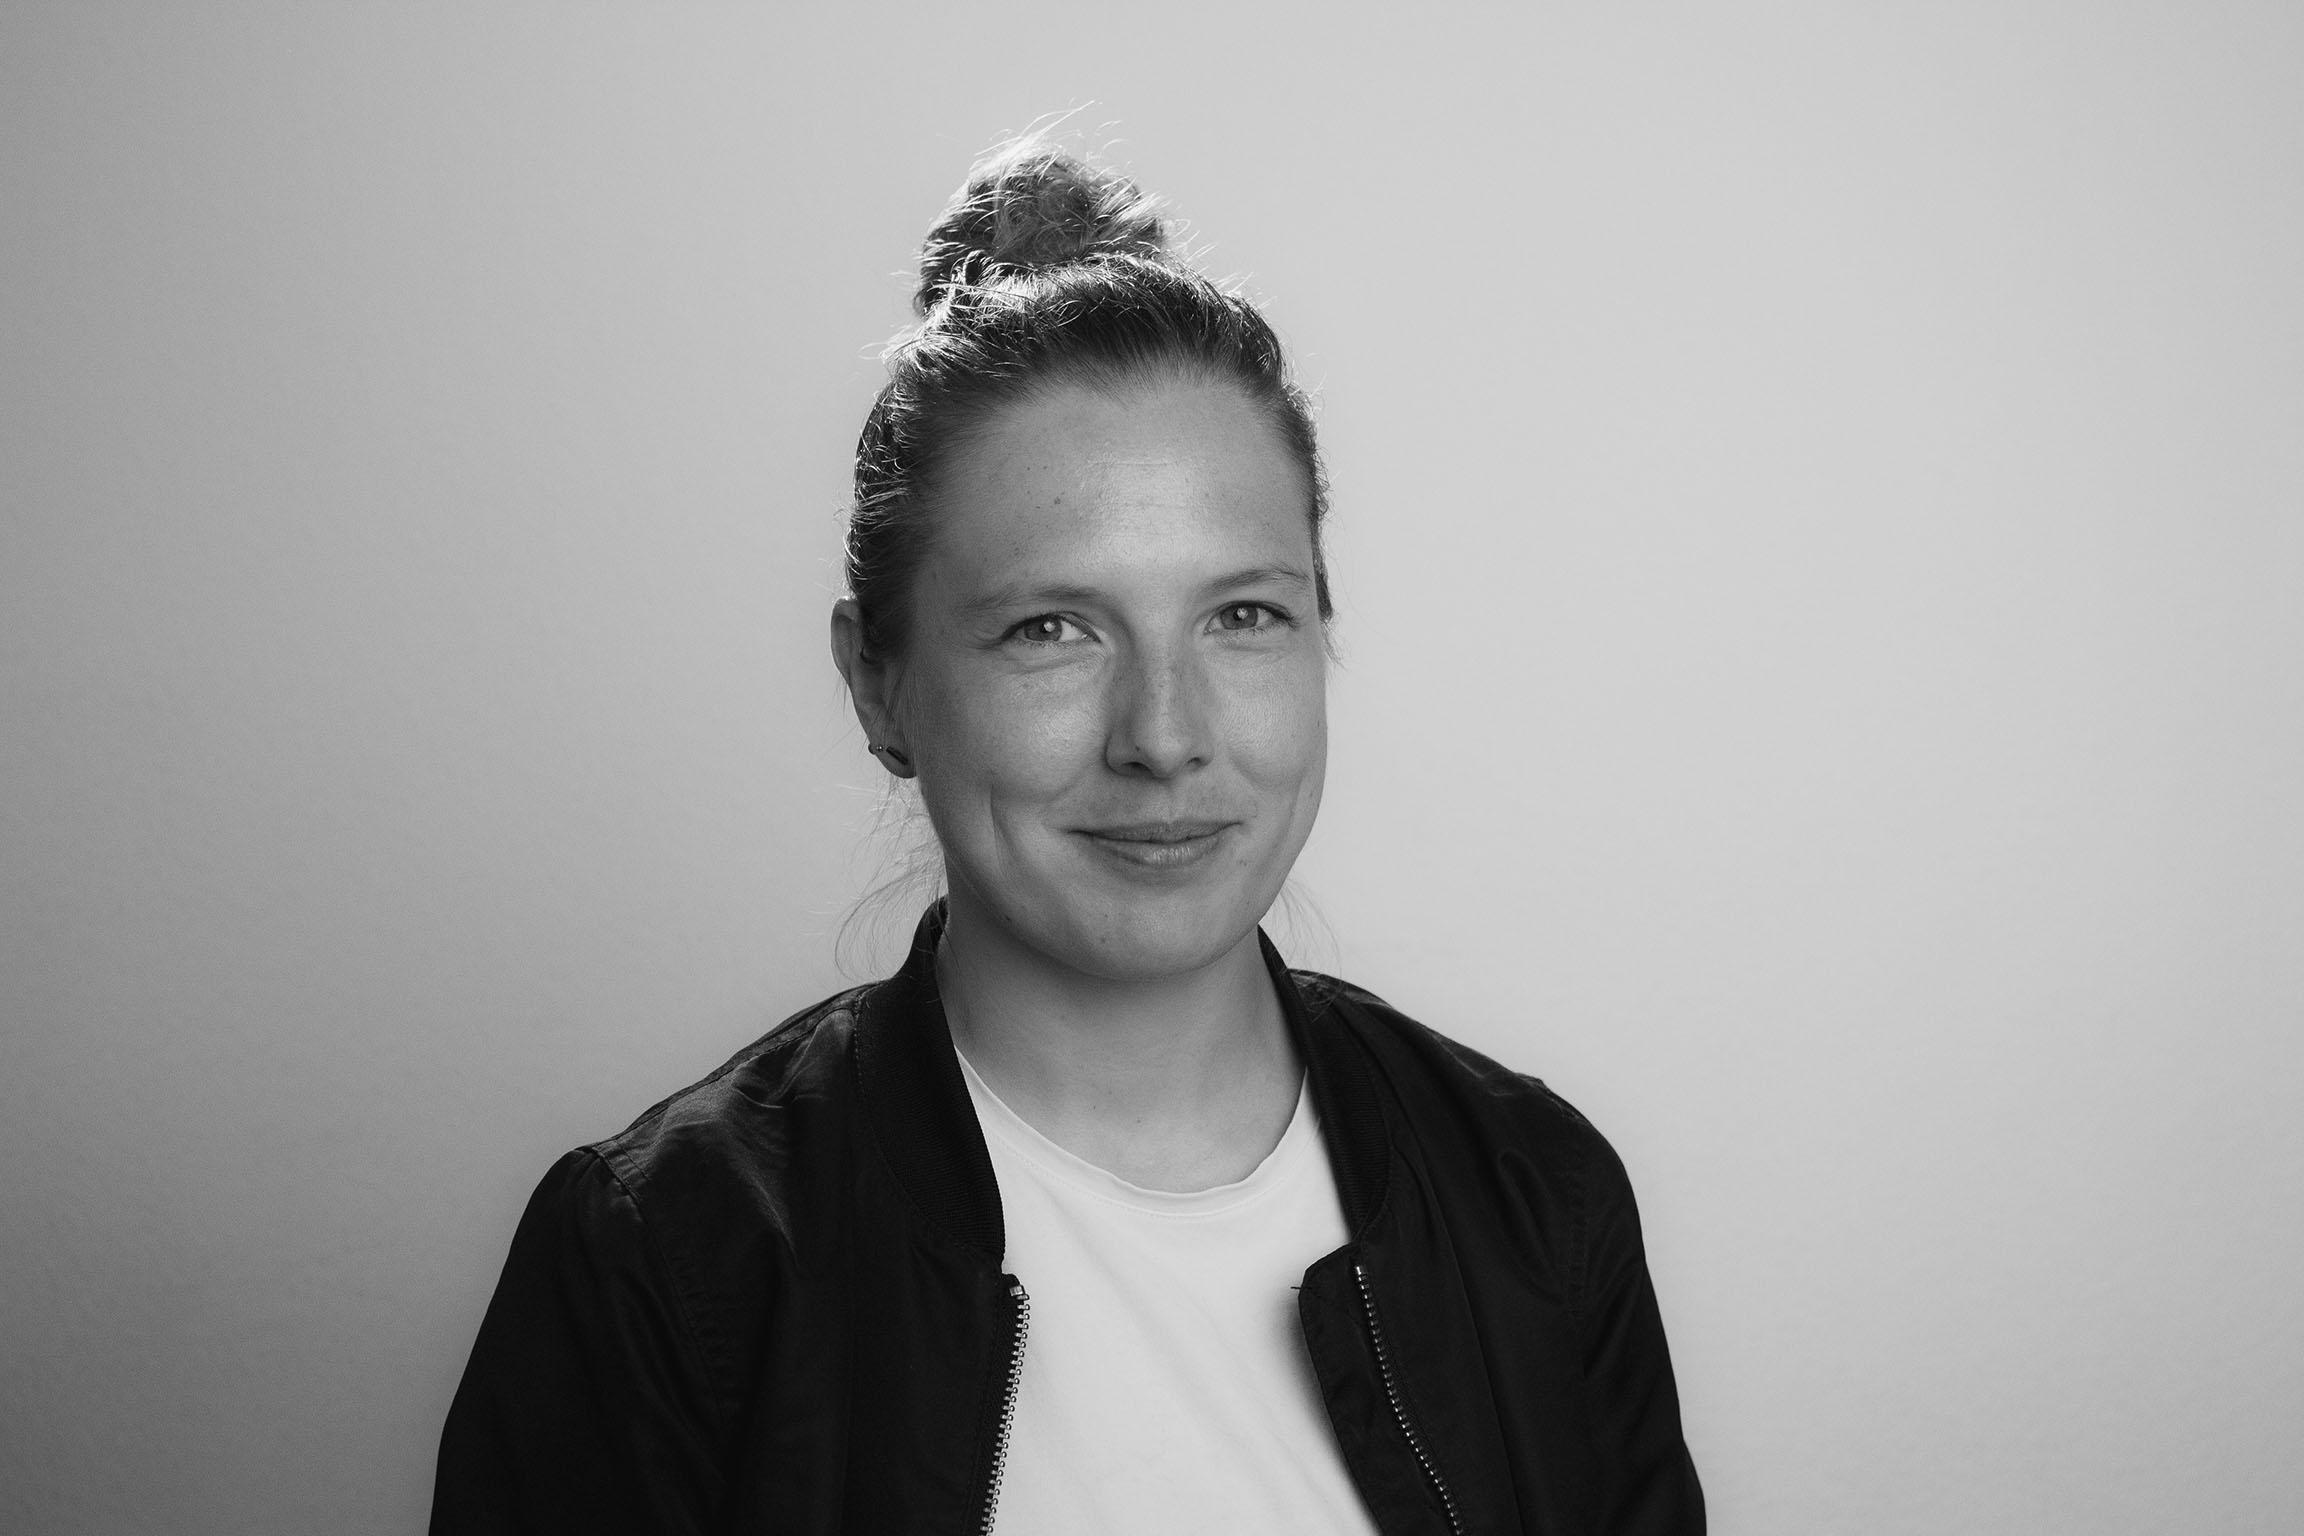 Gesa Heichel